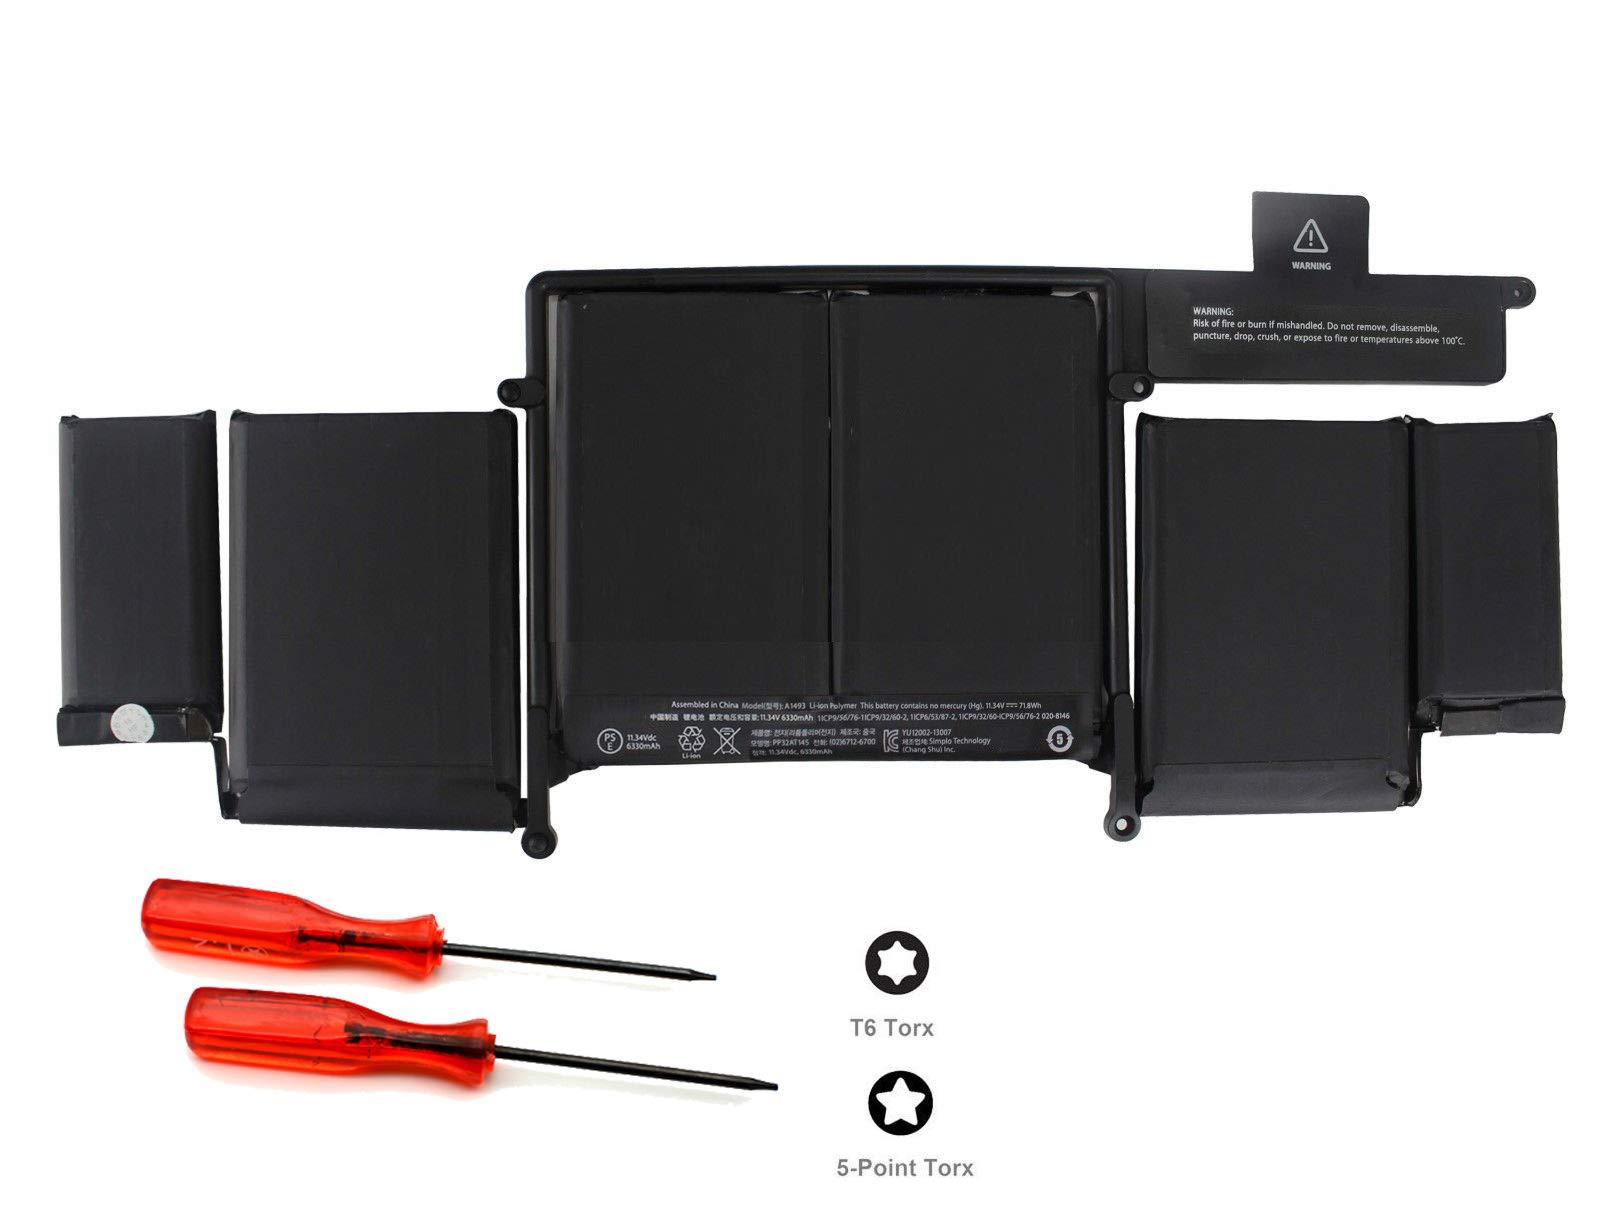 Bateria A1493 MacBook Pro 13 Retina A1502 2013 Me864 Me865 M